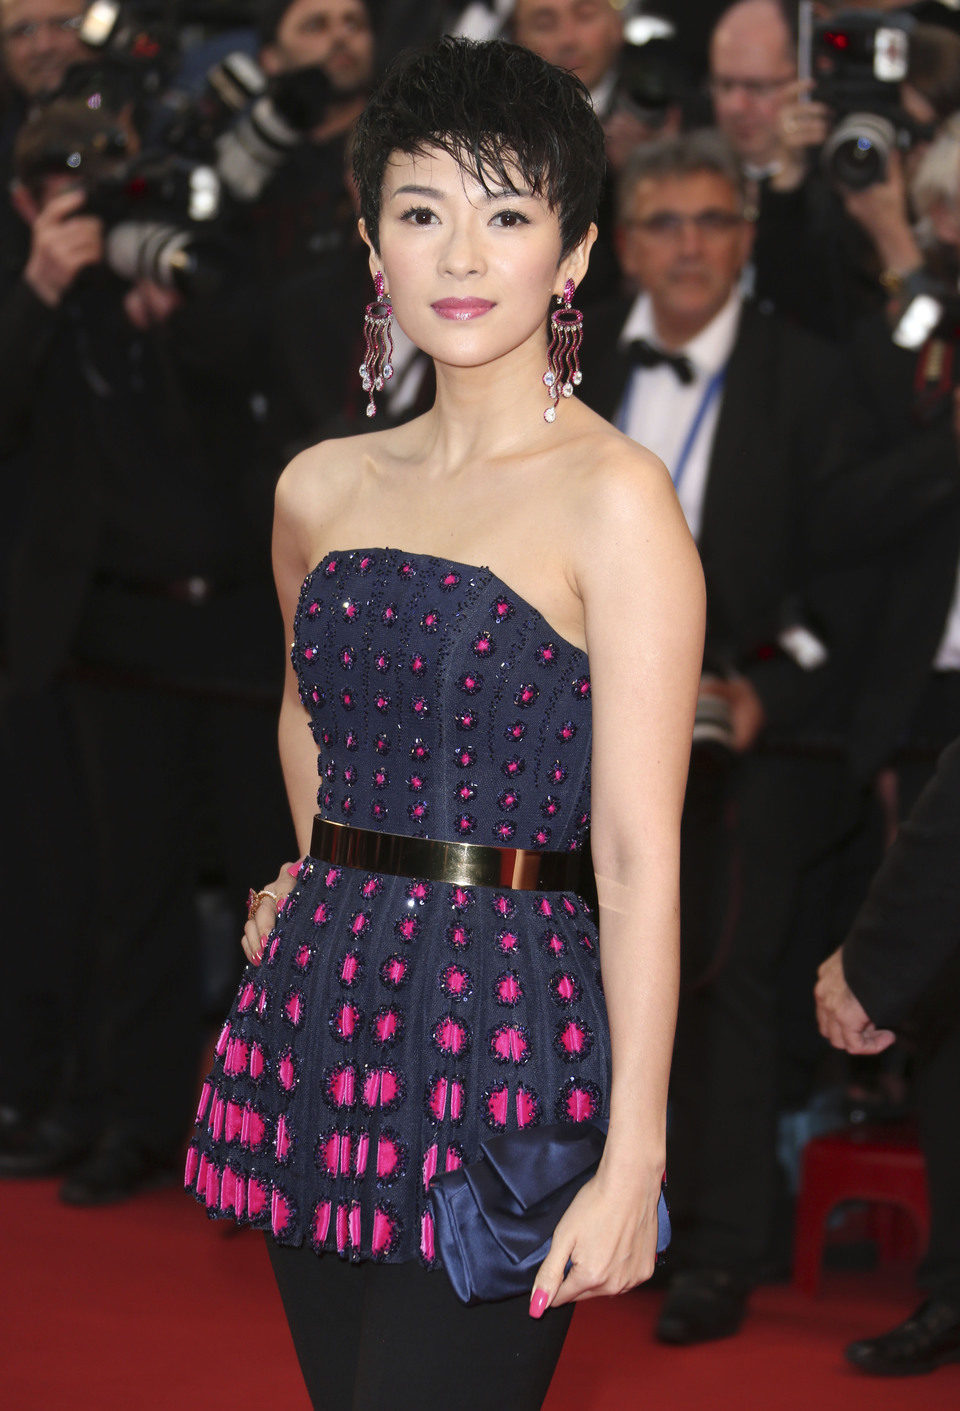 Zhang Ziyi en la fiesta inaugural del Festival de Cannes 2013